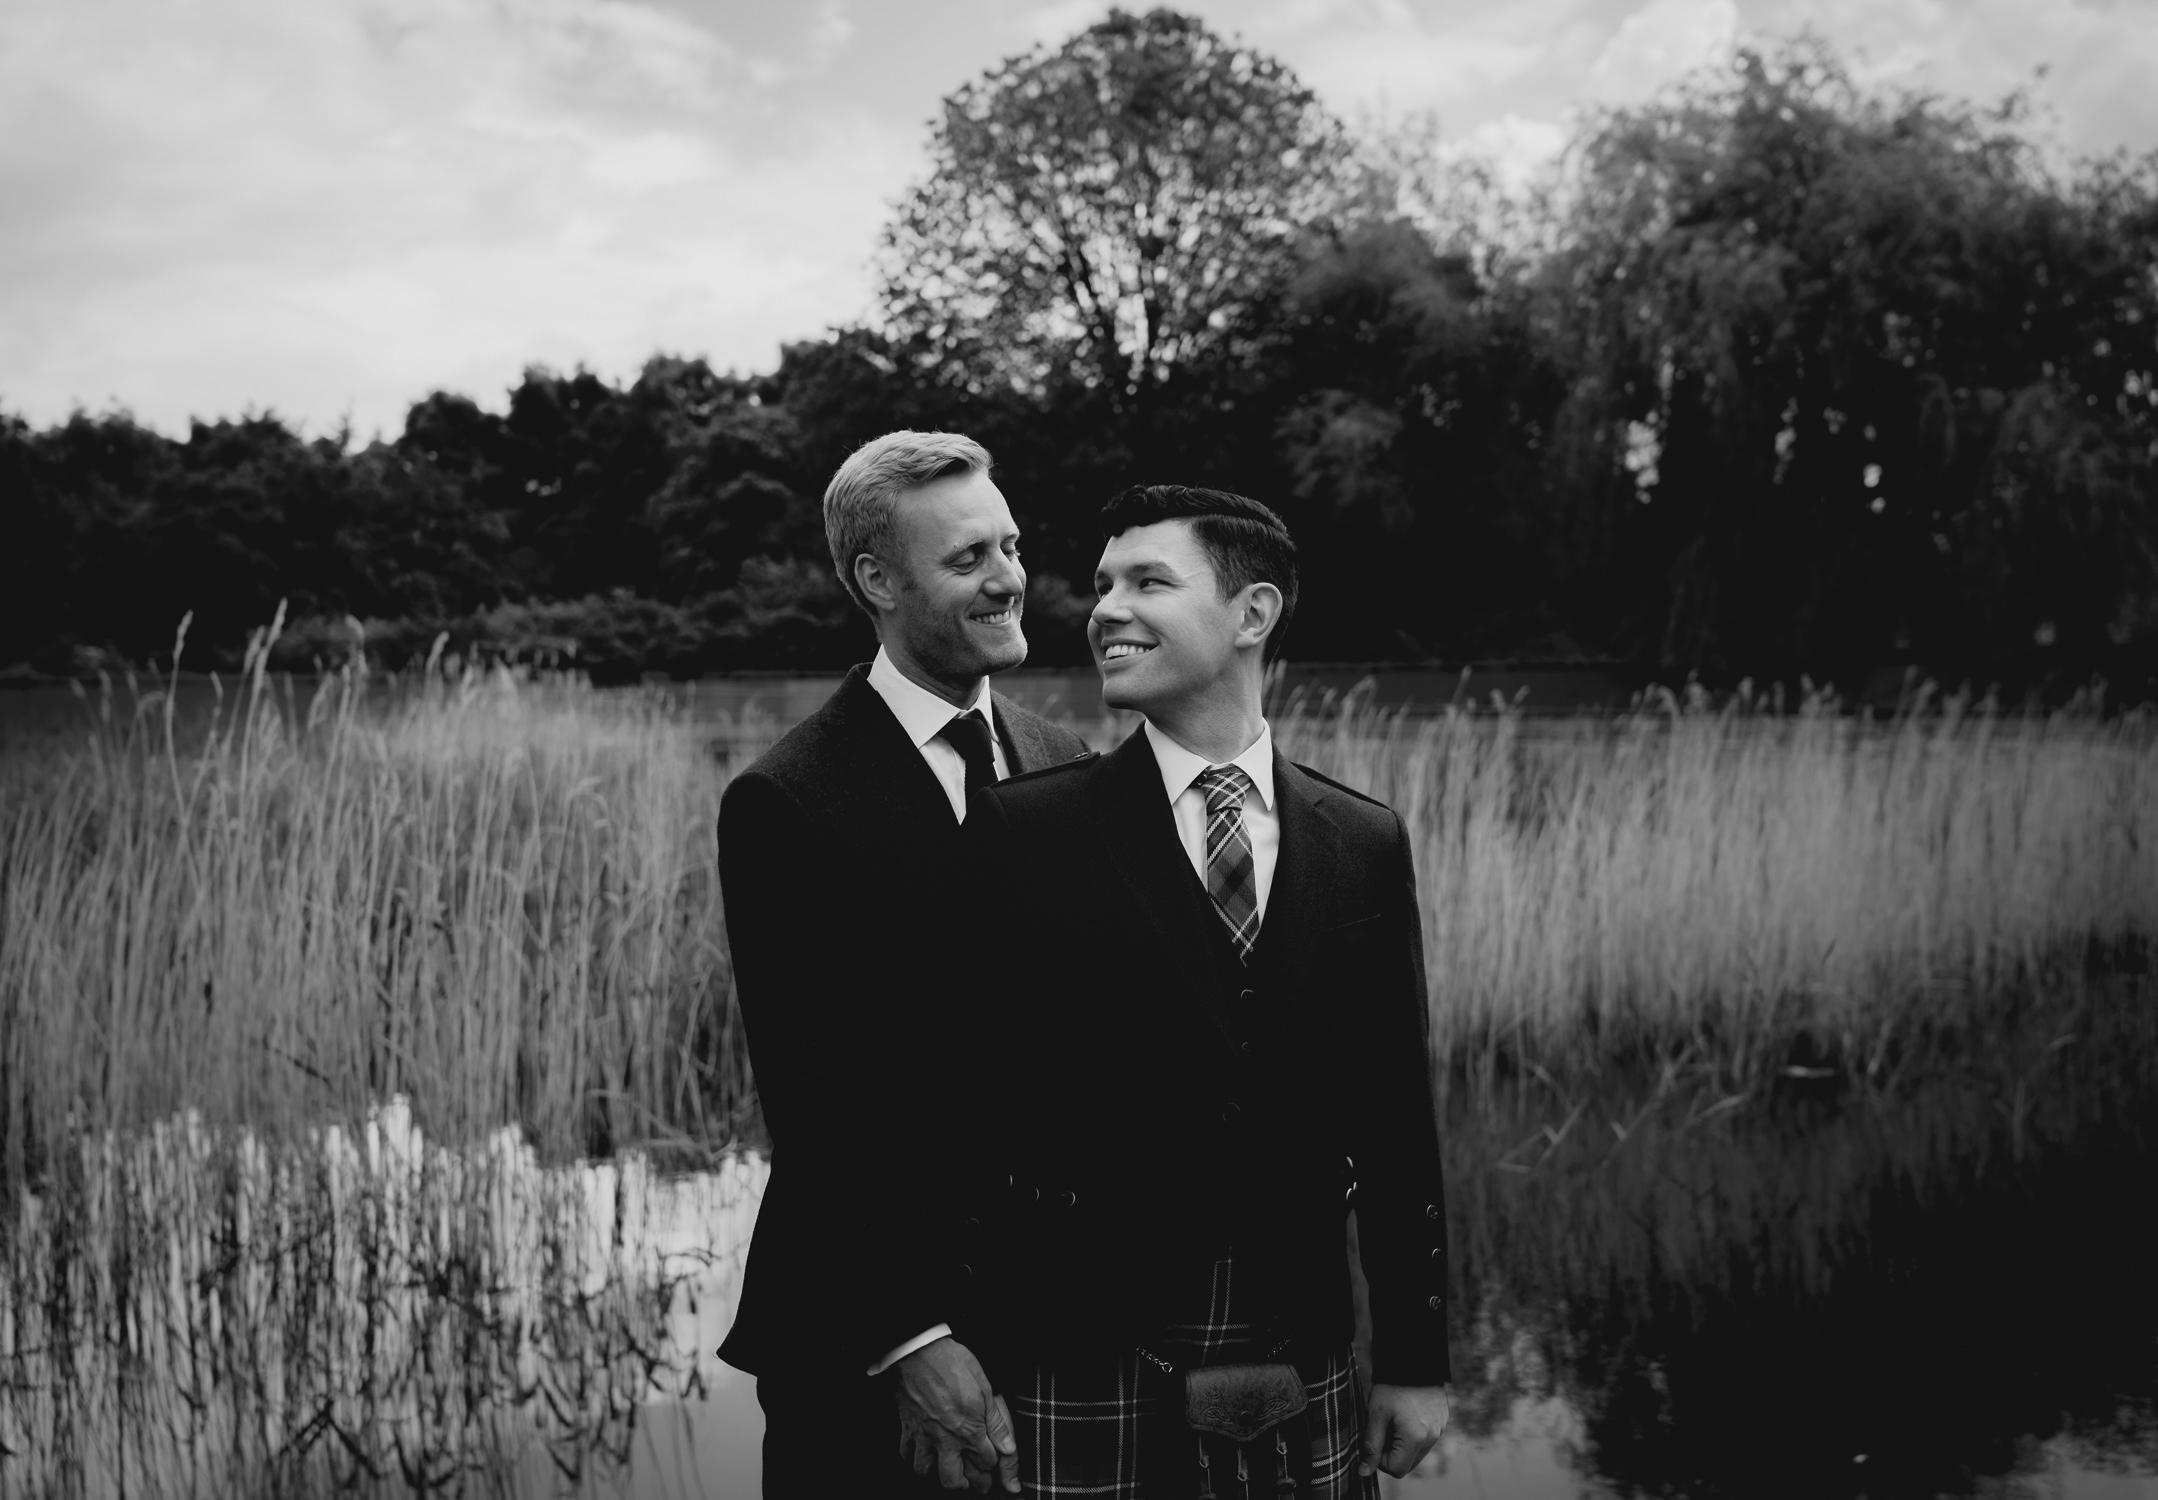 amsterdam wedding photography two men portraits